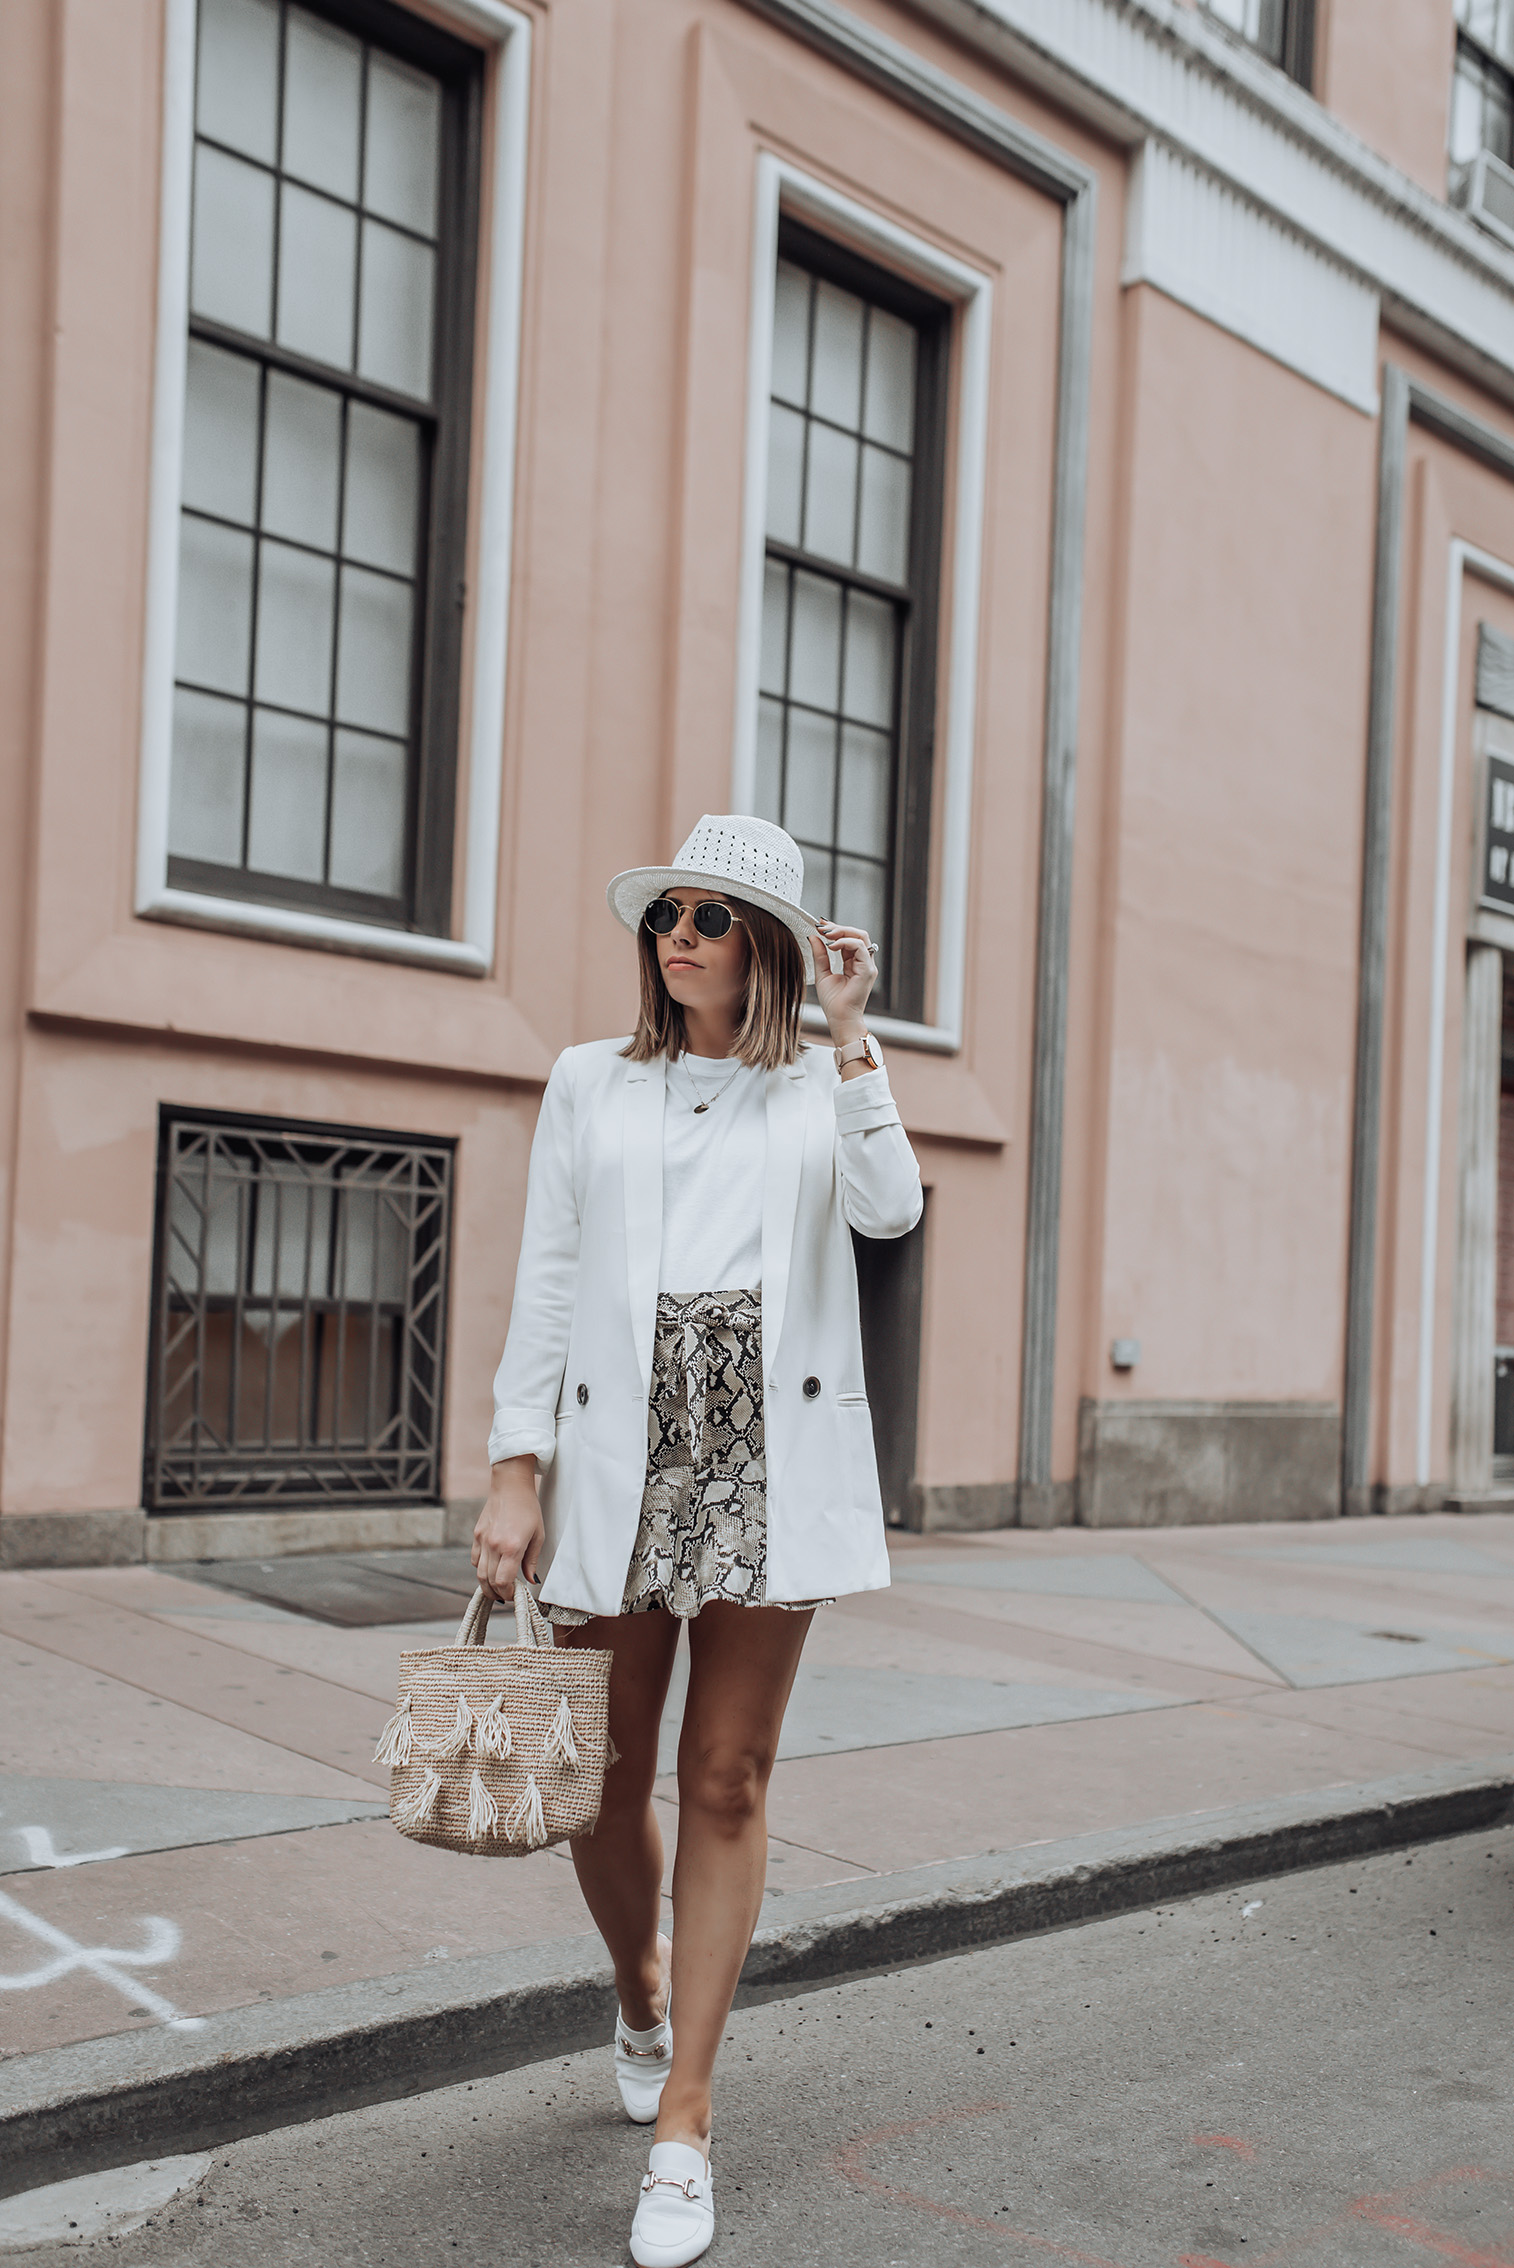 Mixing spring and fall pieces | White mules | Skirt (Zara, similar here) | Similar Hat | White Blazer| Tassel Bag #snakeprint #blazeroutfits #topshop #zara #streetstyle